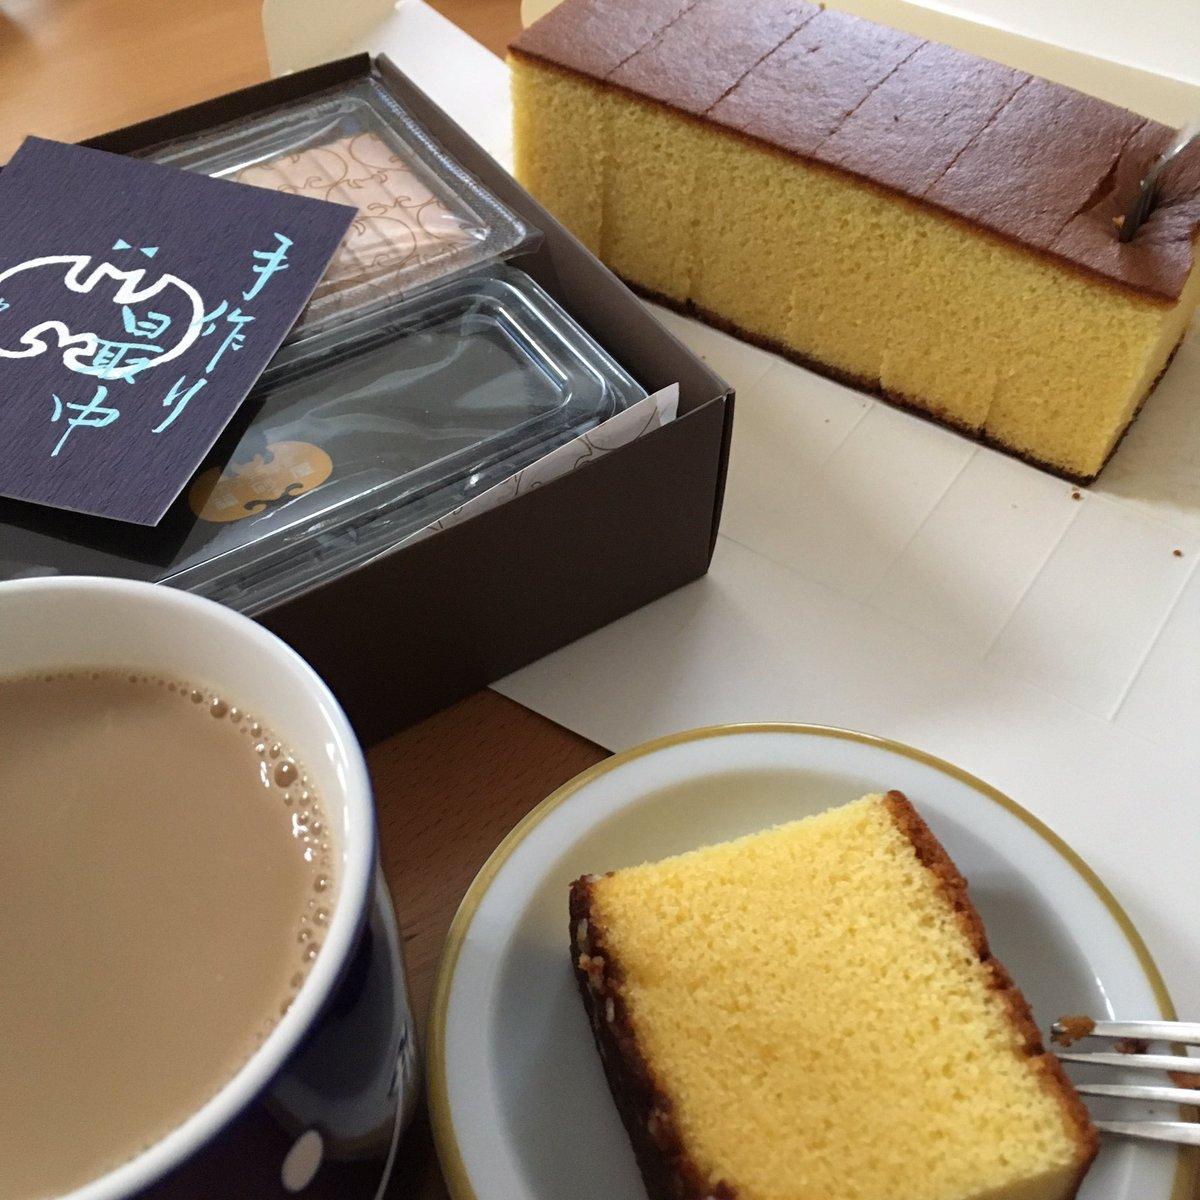 test ツイッターメディア - 中目黒まで行ったので、福砂屋のカステラと最中をお土産にお茶☕️ https://t.co/KatbP6T6pJ